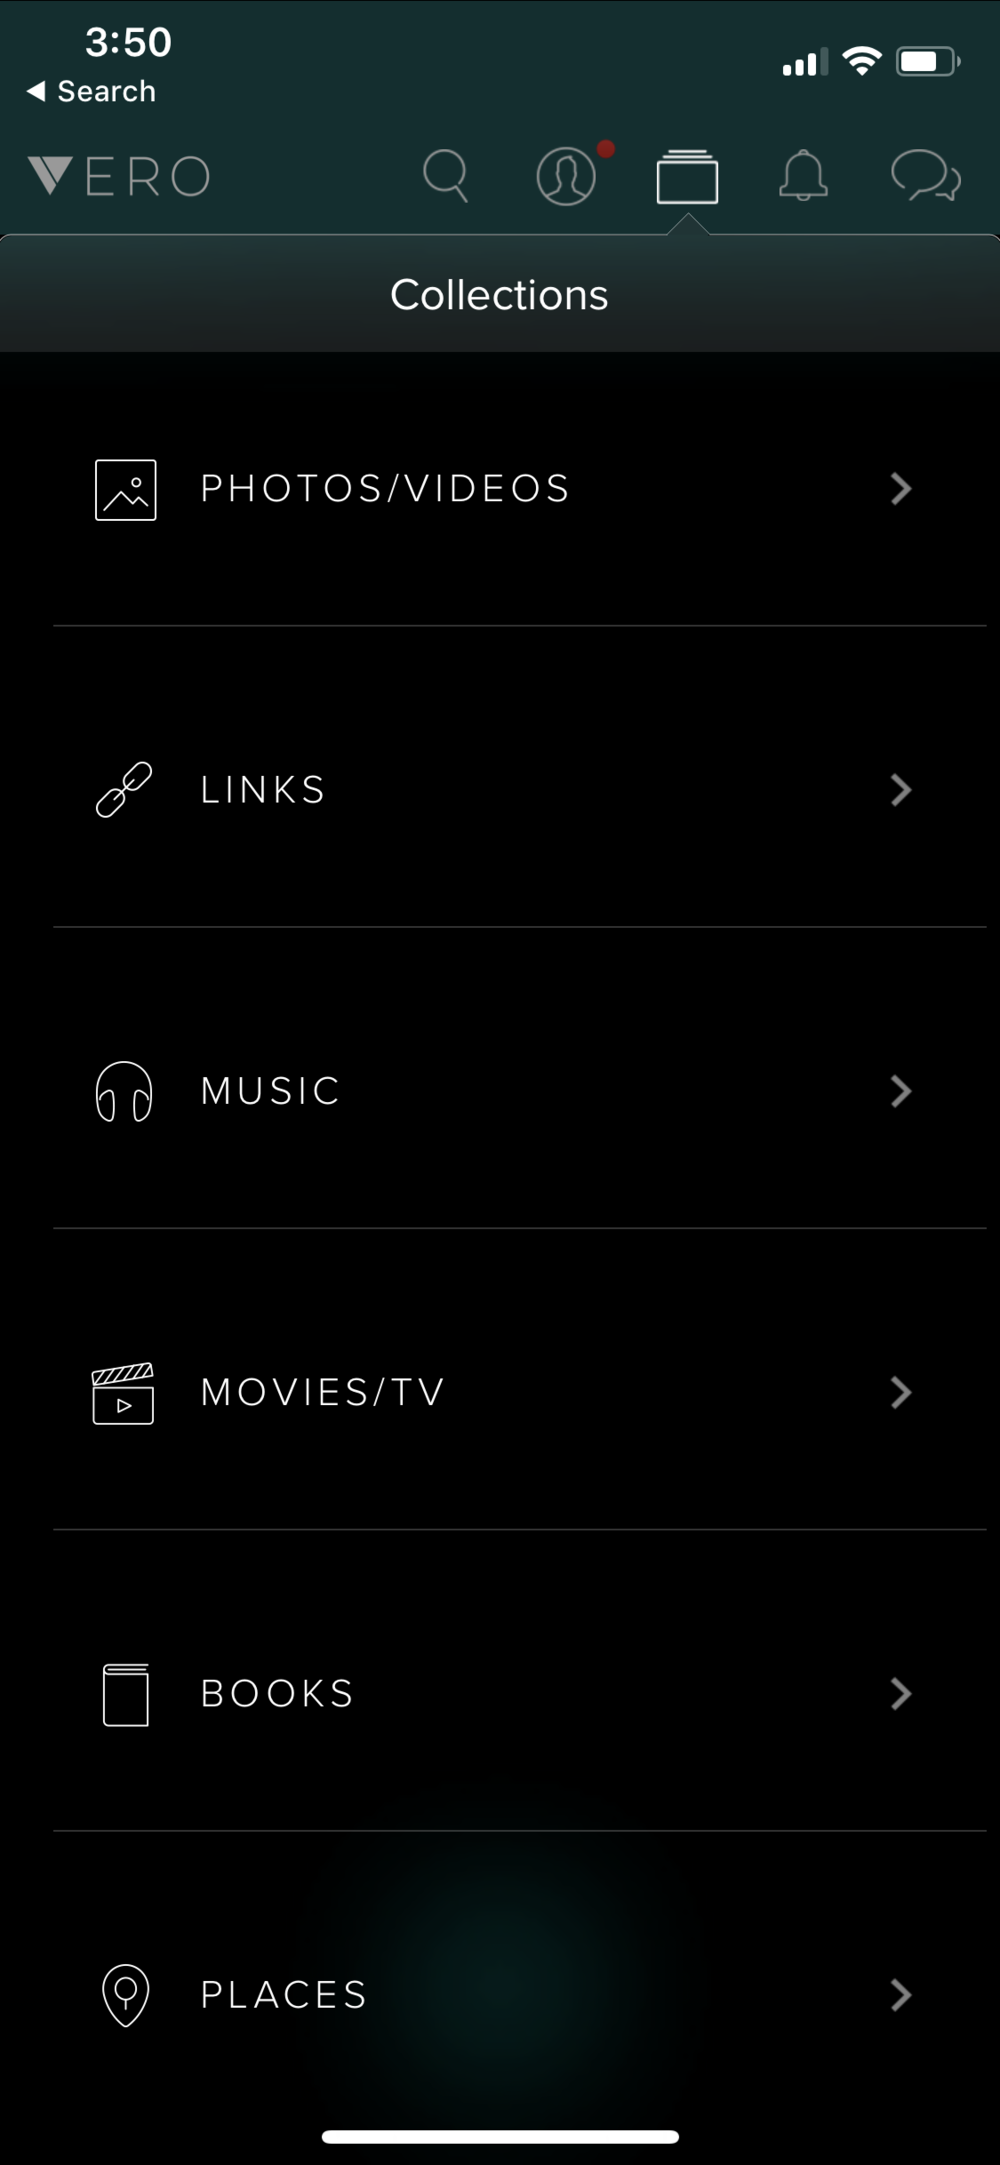 Vero App Collections